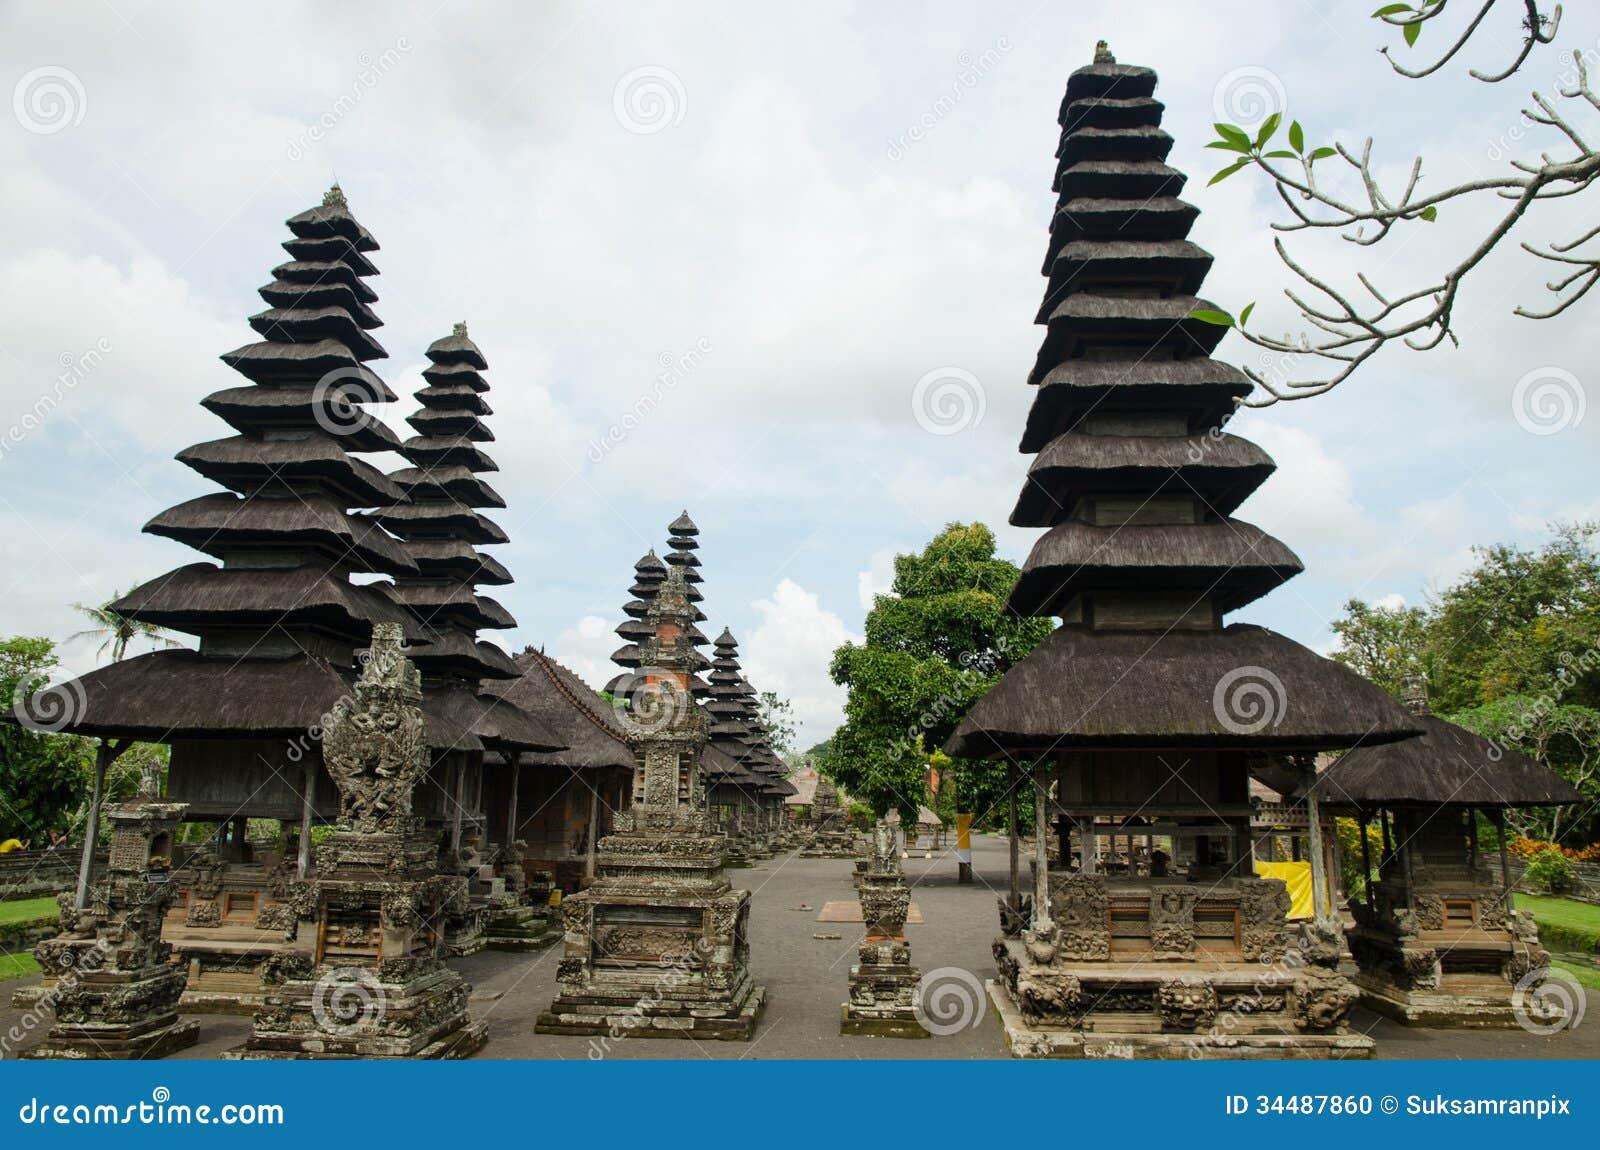 Balinese Hindu Temple Taman Ayun In Mengwi Bali Indonesia